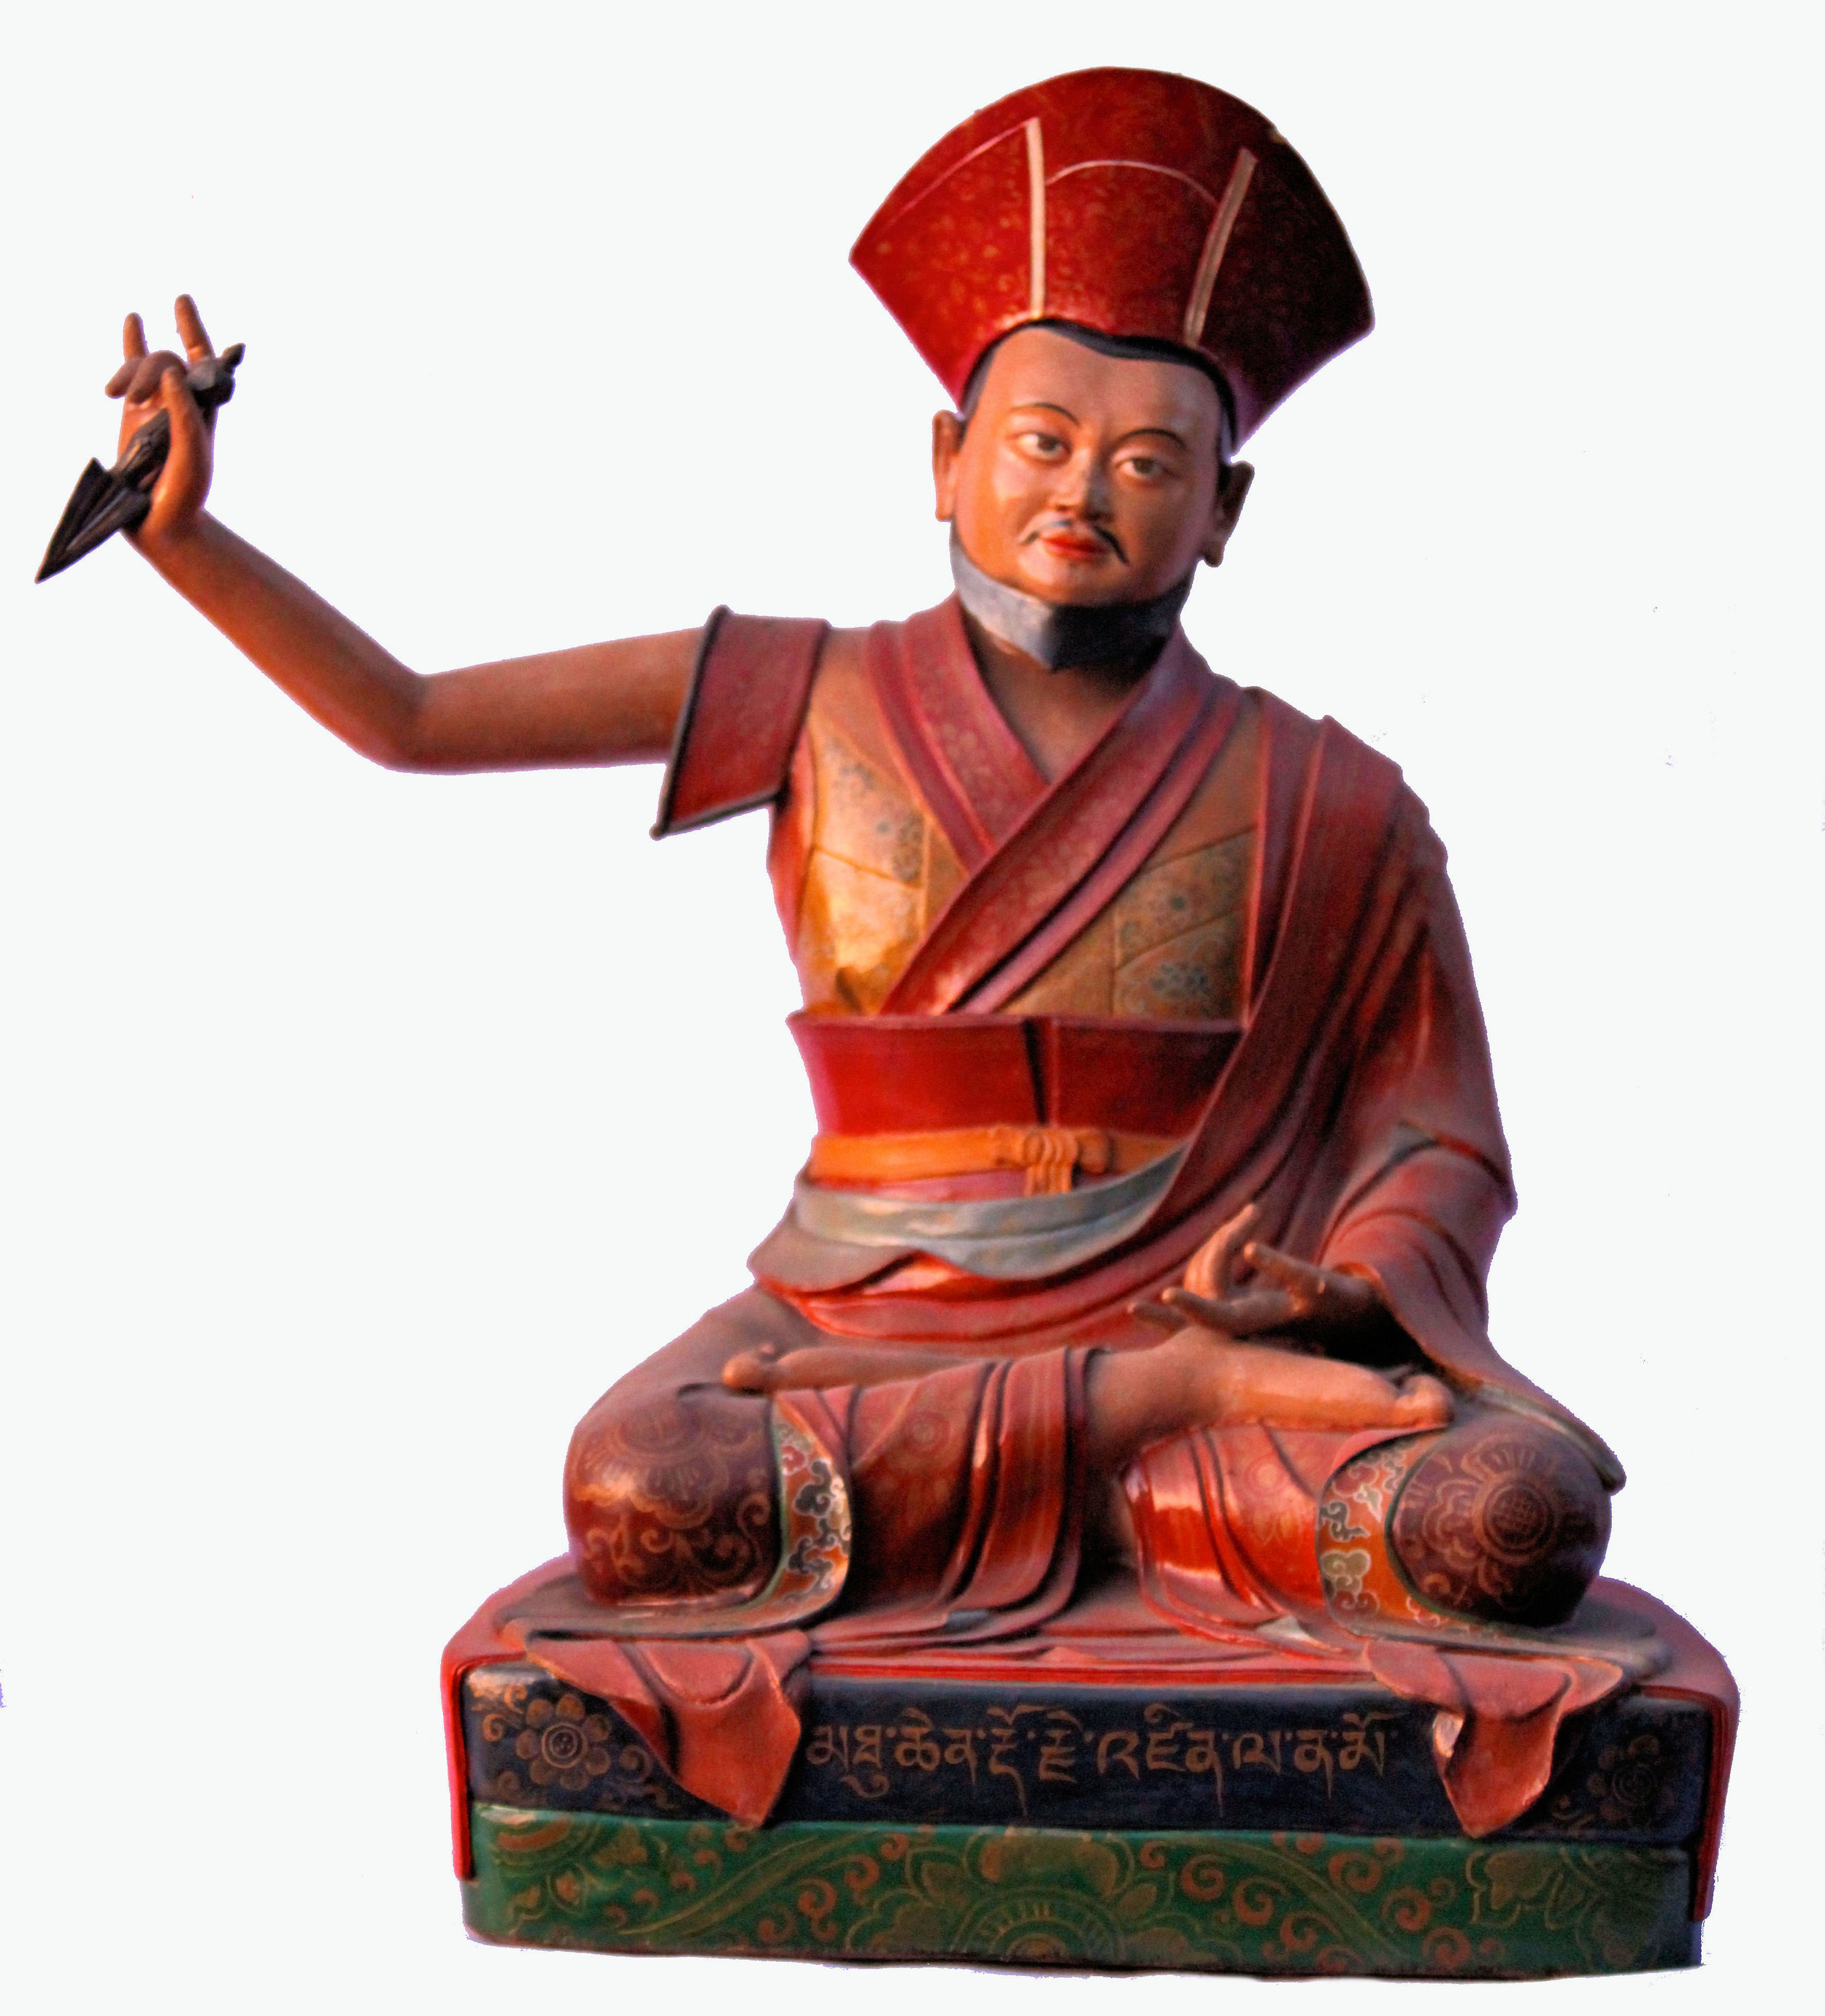 The 1st Drukpa Choegon Rinpoche, Druk Shabdrung Choekyi Gonpo; renowned as the Dorje Dzinpa of Tsari